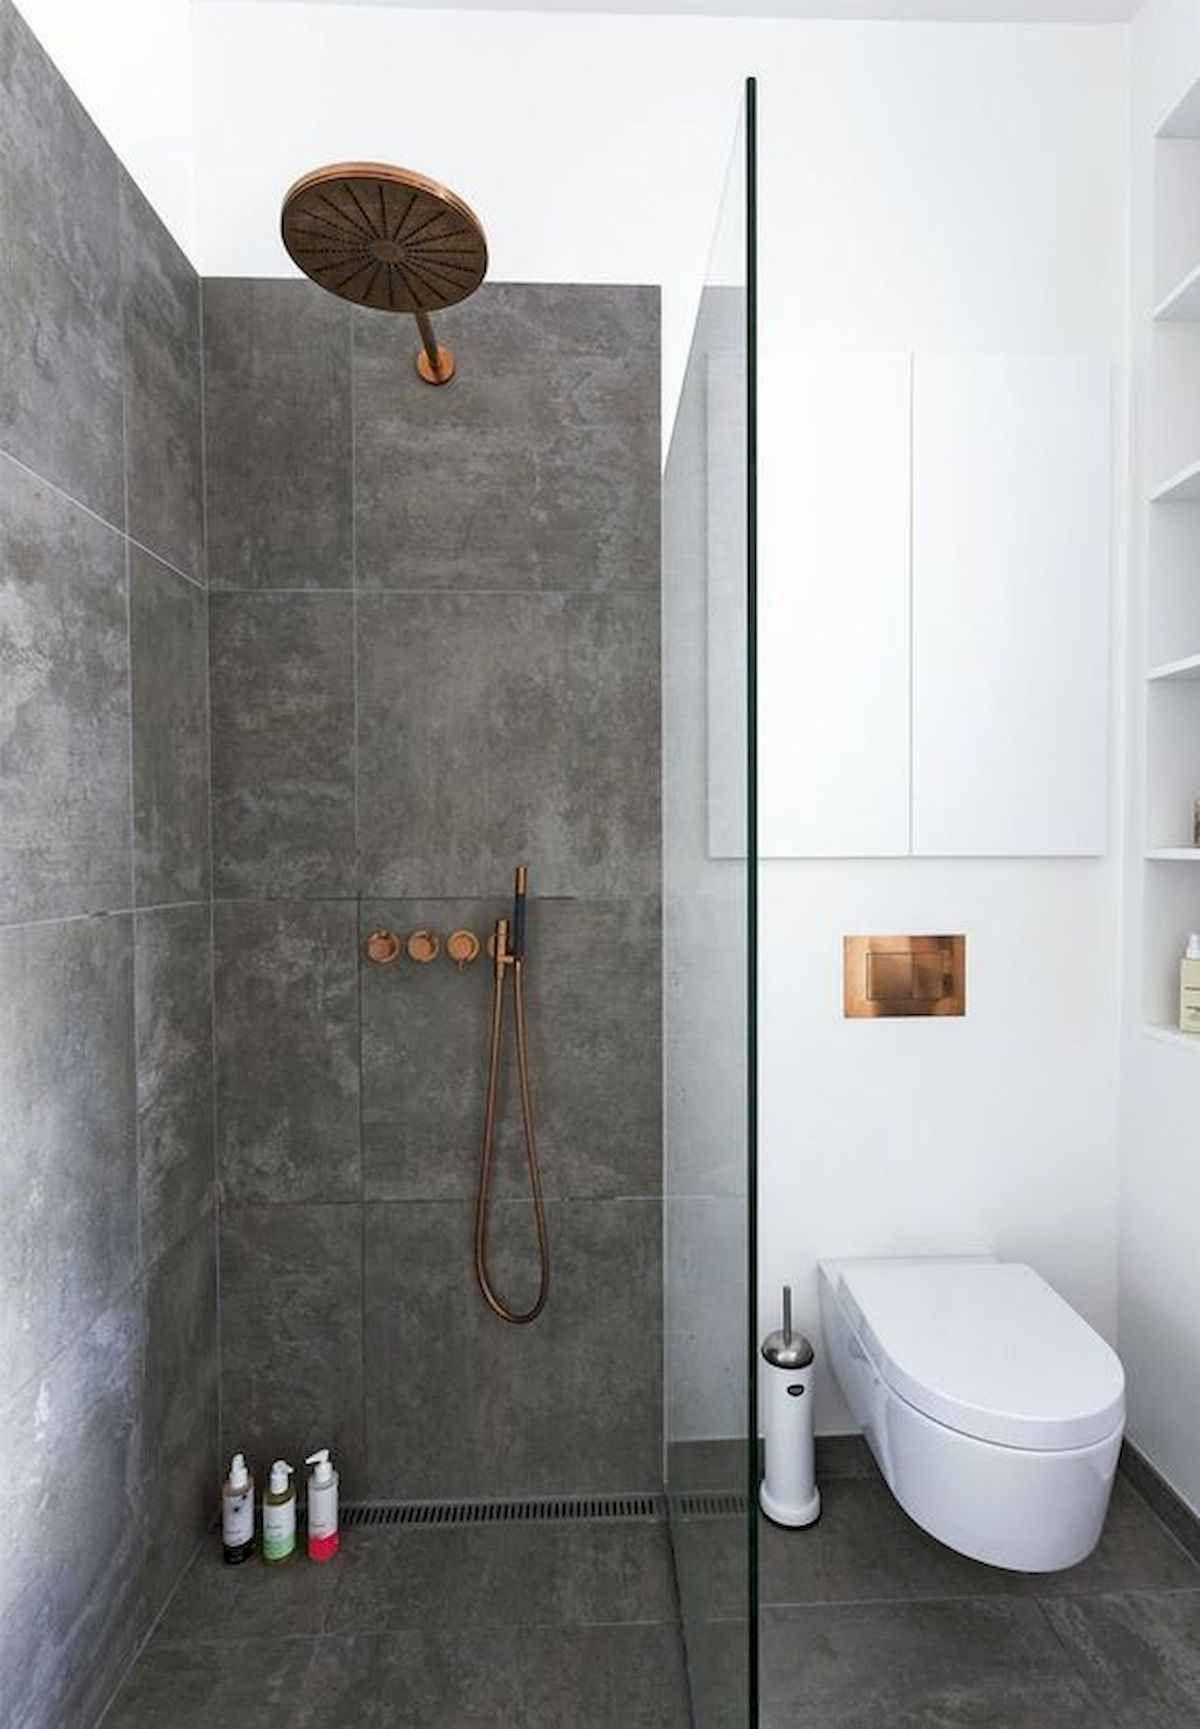 50 stunning small bathroom makeover ideas 14 small on stunning small bathroom design ideas id=80380